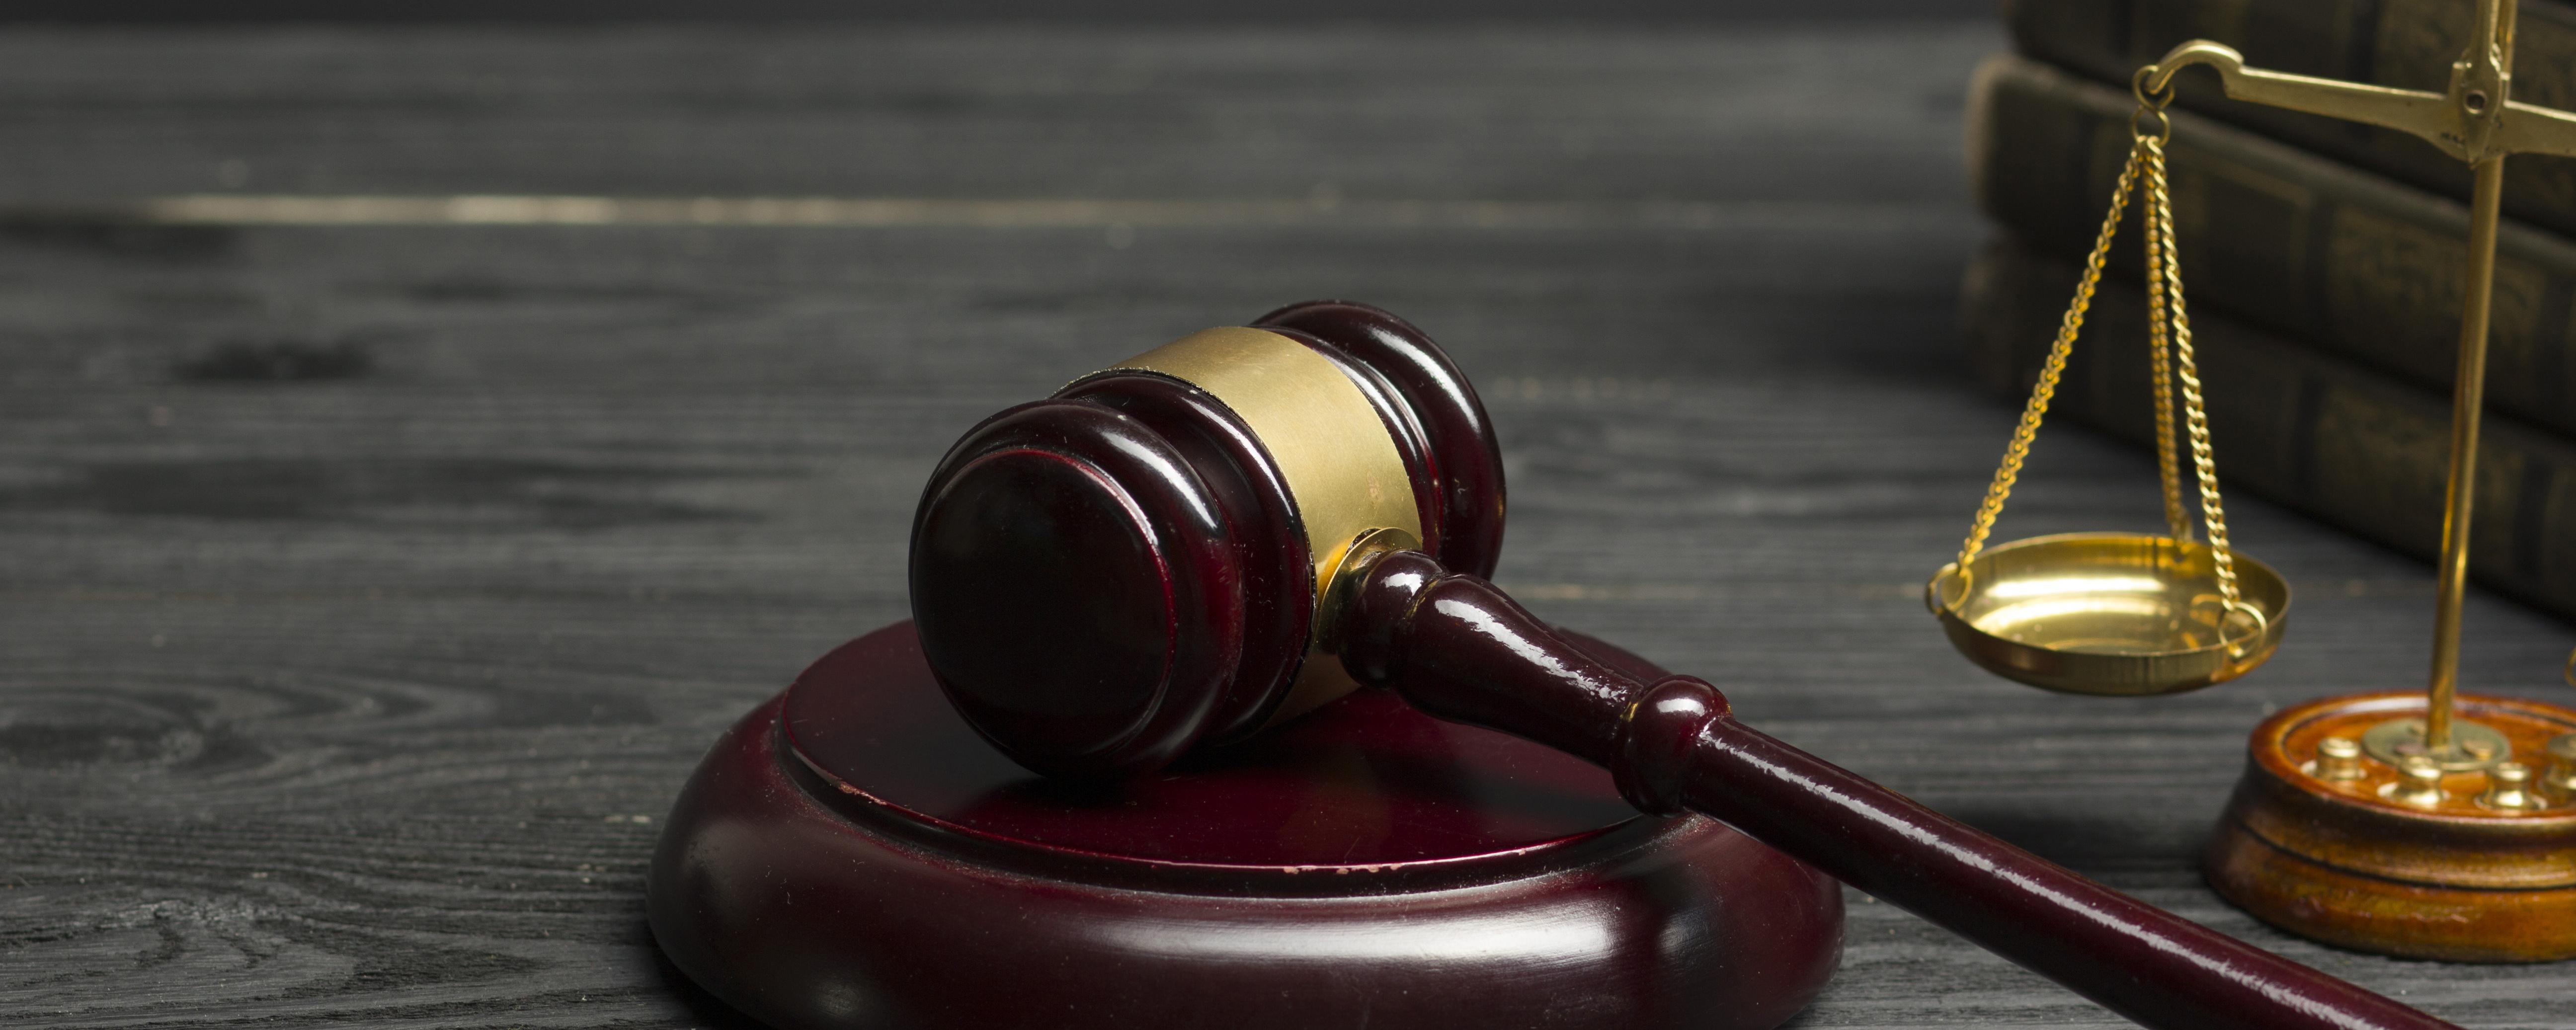 Company law gavel